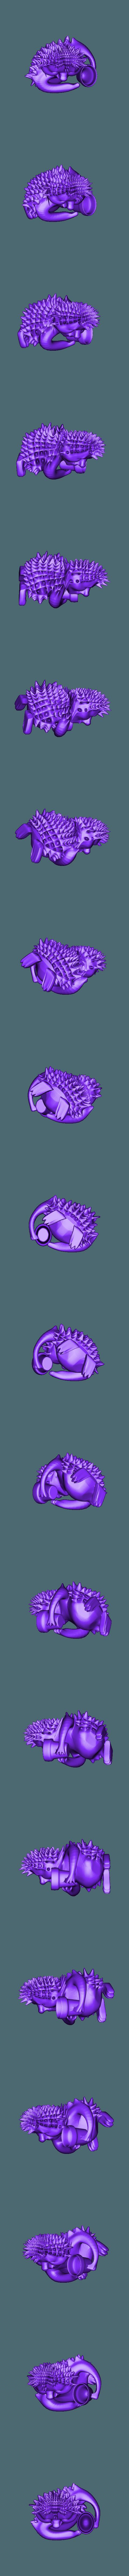 Ежик.stl Download free STL file Hedgehog • 3D print object, MaKsi3D